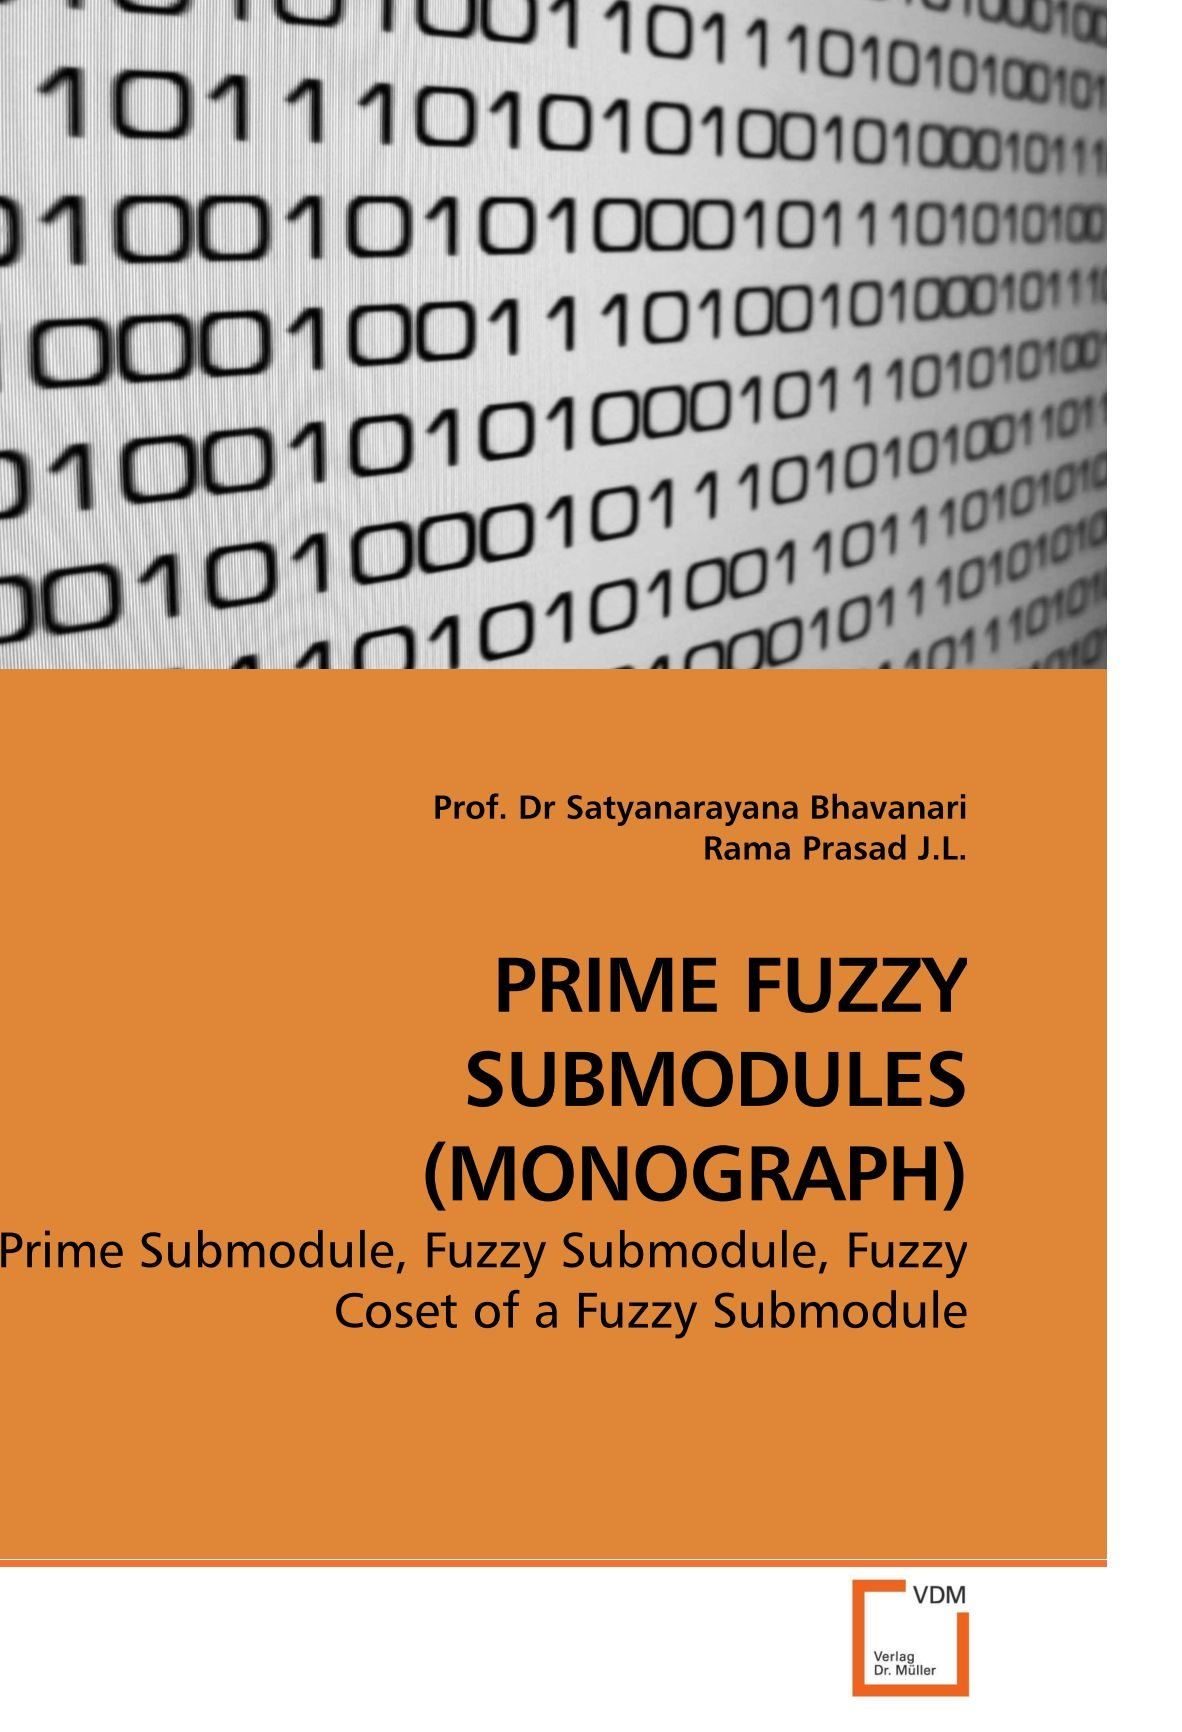 Download PRIME FUZZY SUBMODULES (MONOGRAPH): Prime Submodule, Fuzzy Submodule, Fuzzy Coset of a Fuzzy Submodule PDF